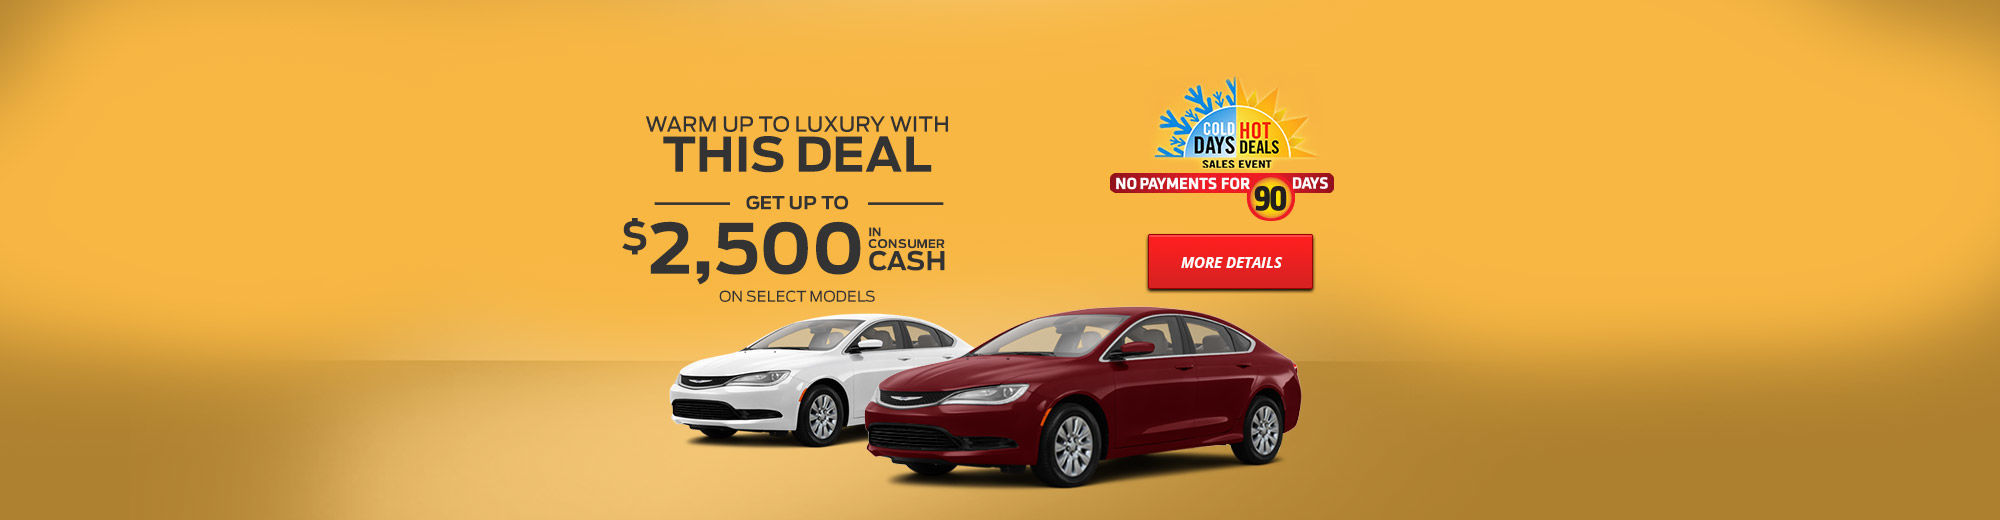 Cold Days, Hot Deals, Sales Event - Chrysler